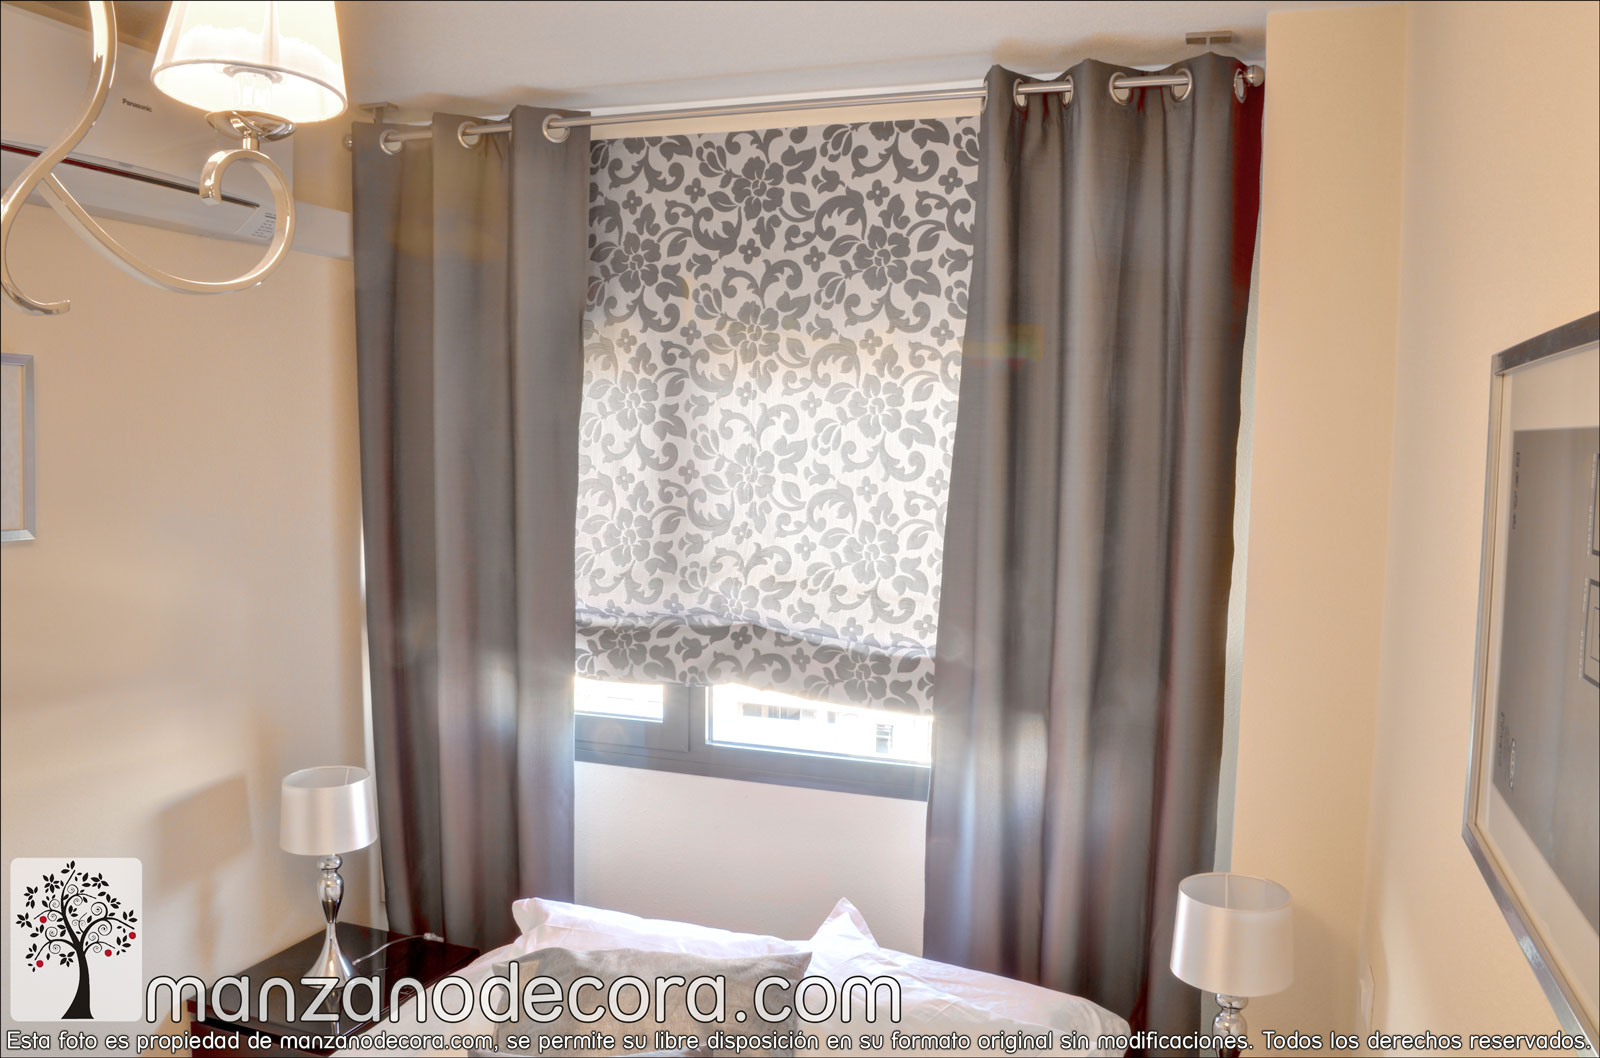 Cortinas cortinas manzanodecora for Ollaos para cortinas